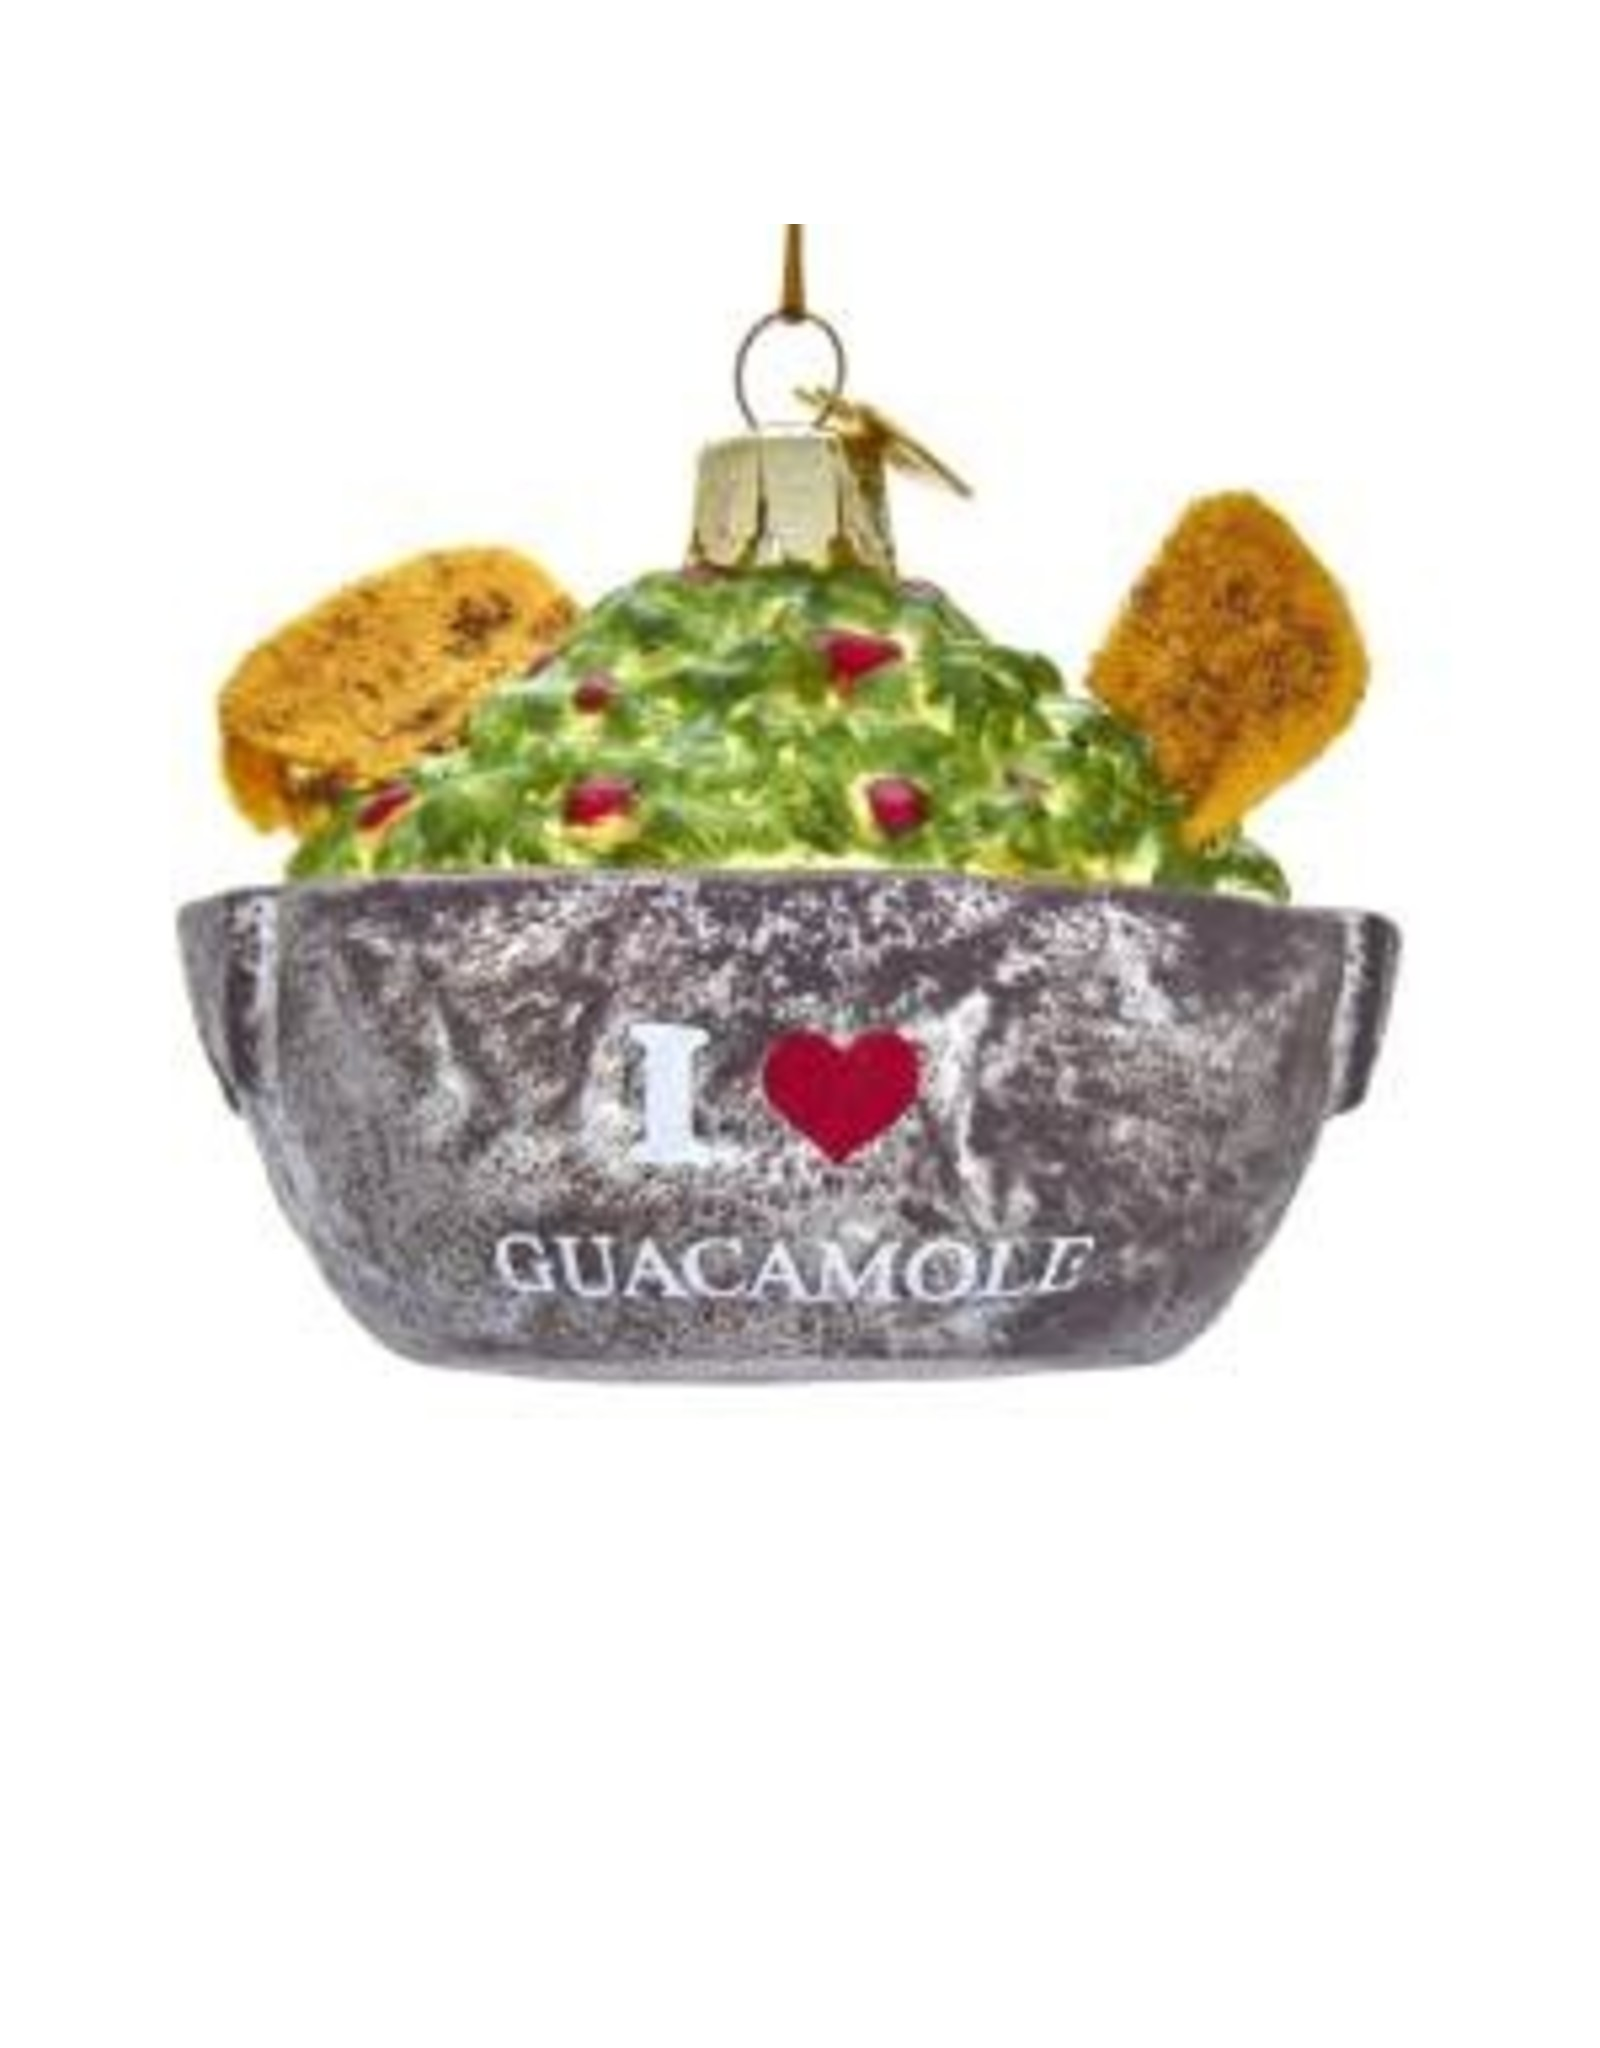 Kurt S. Adler Guacamole Bowl Orn